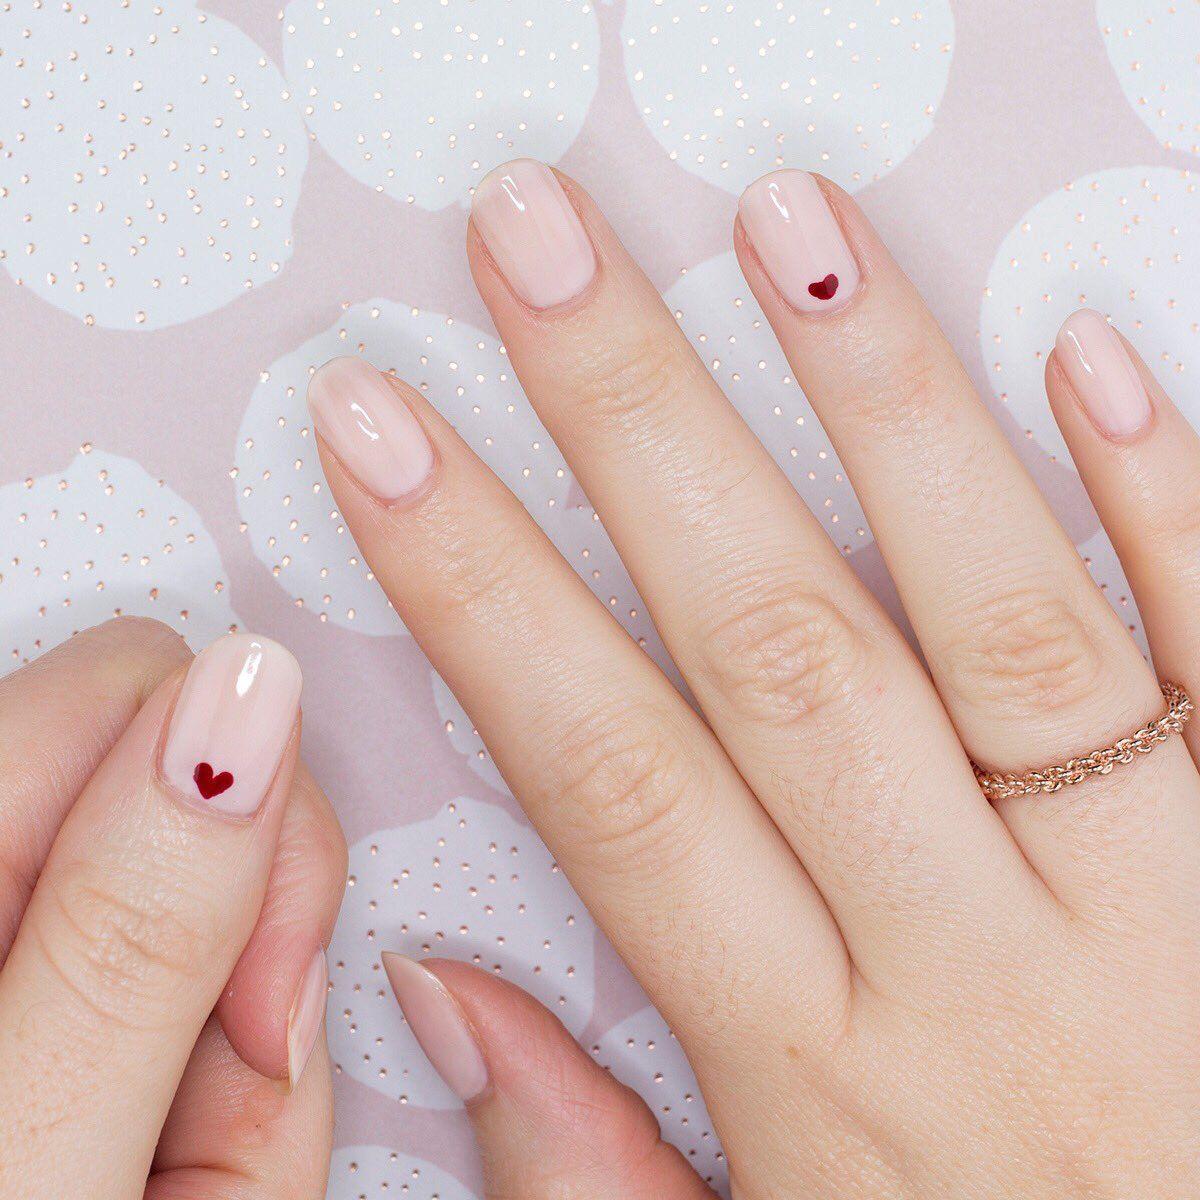 Jennifer Dye On Twitter Heart Nail Designs Heart Nails Nail Designs